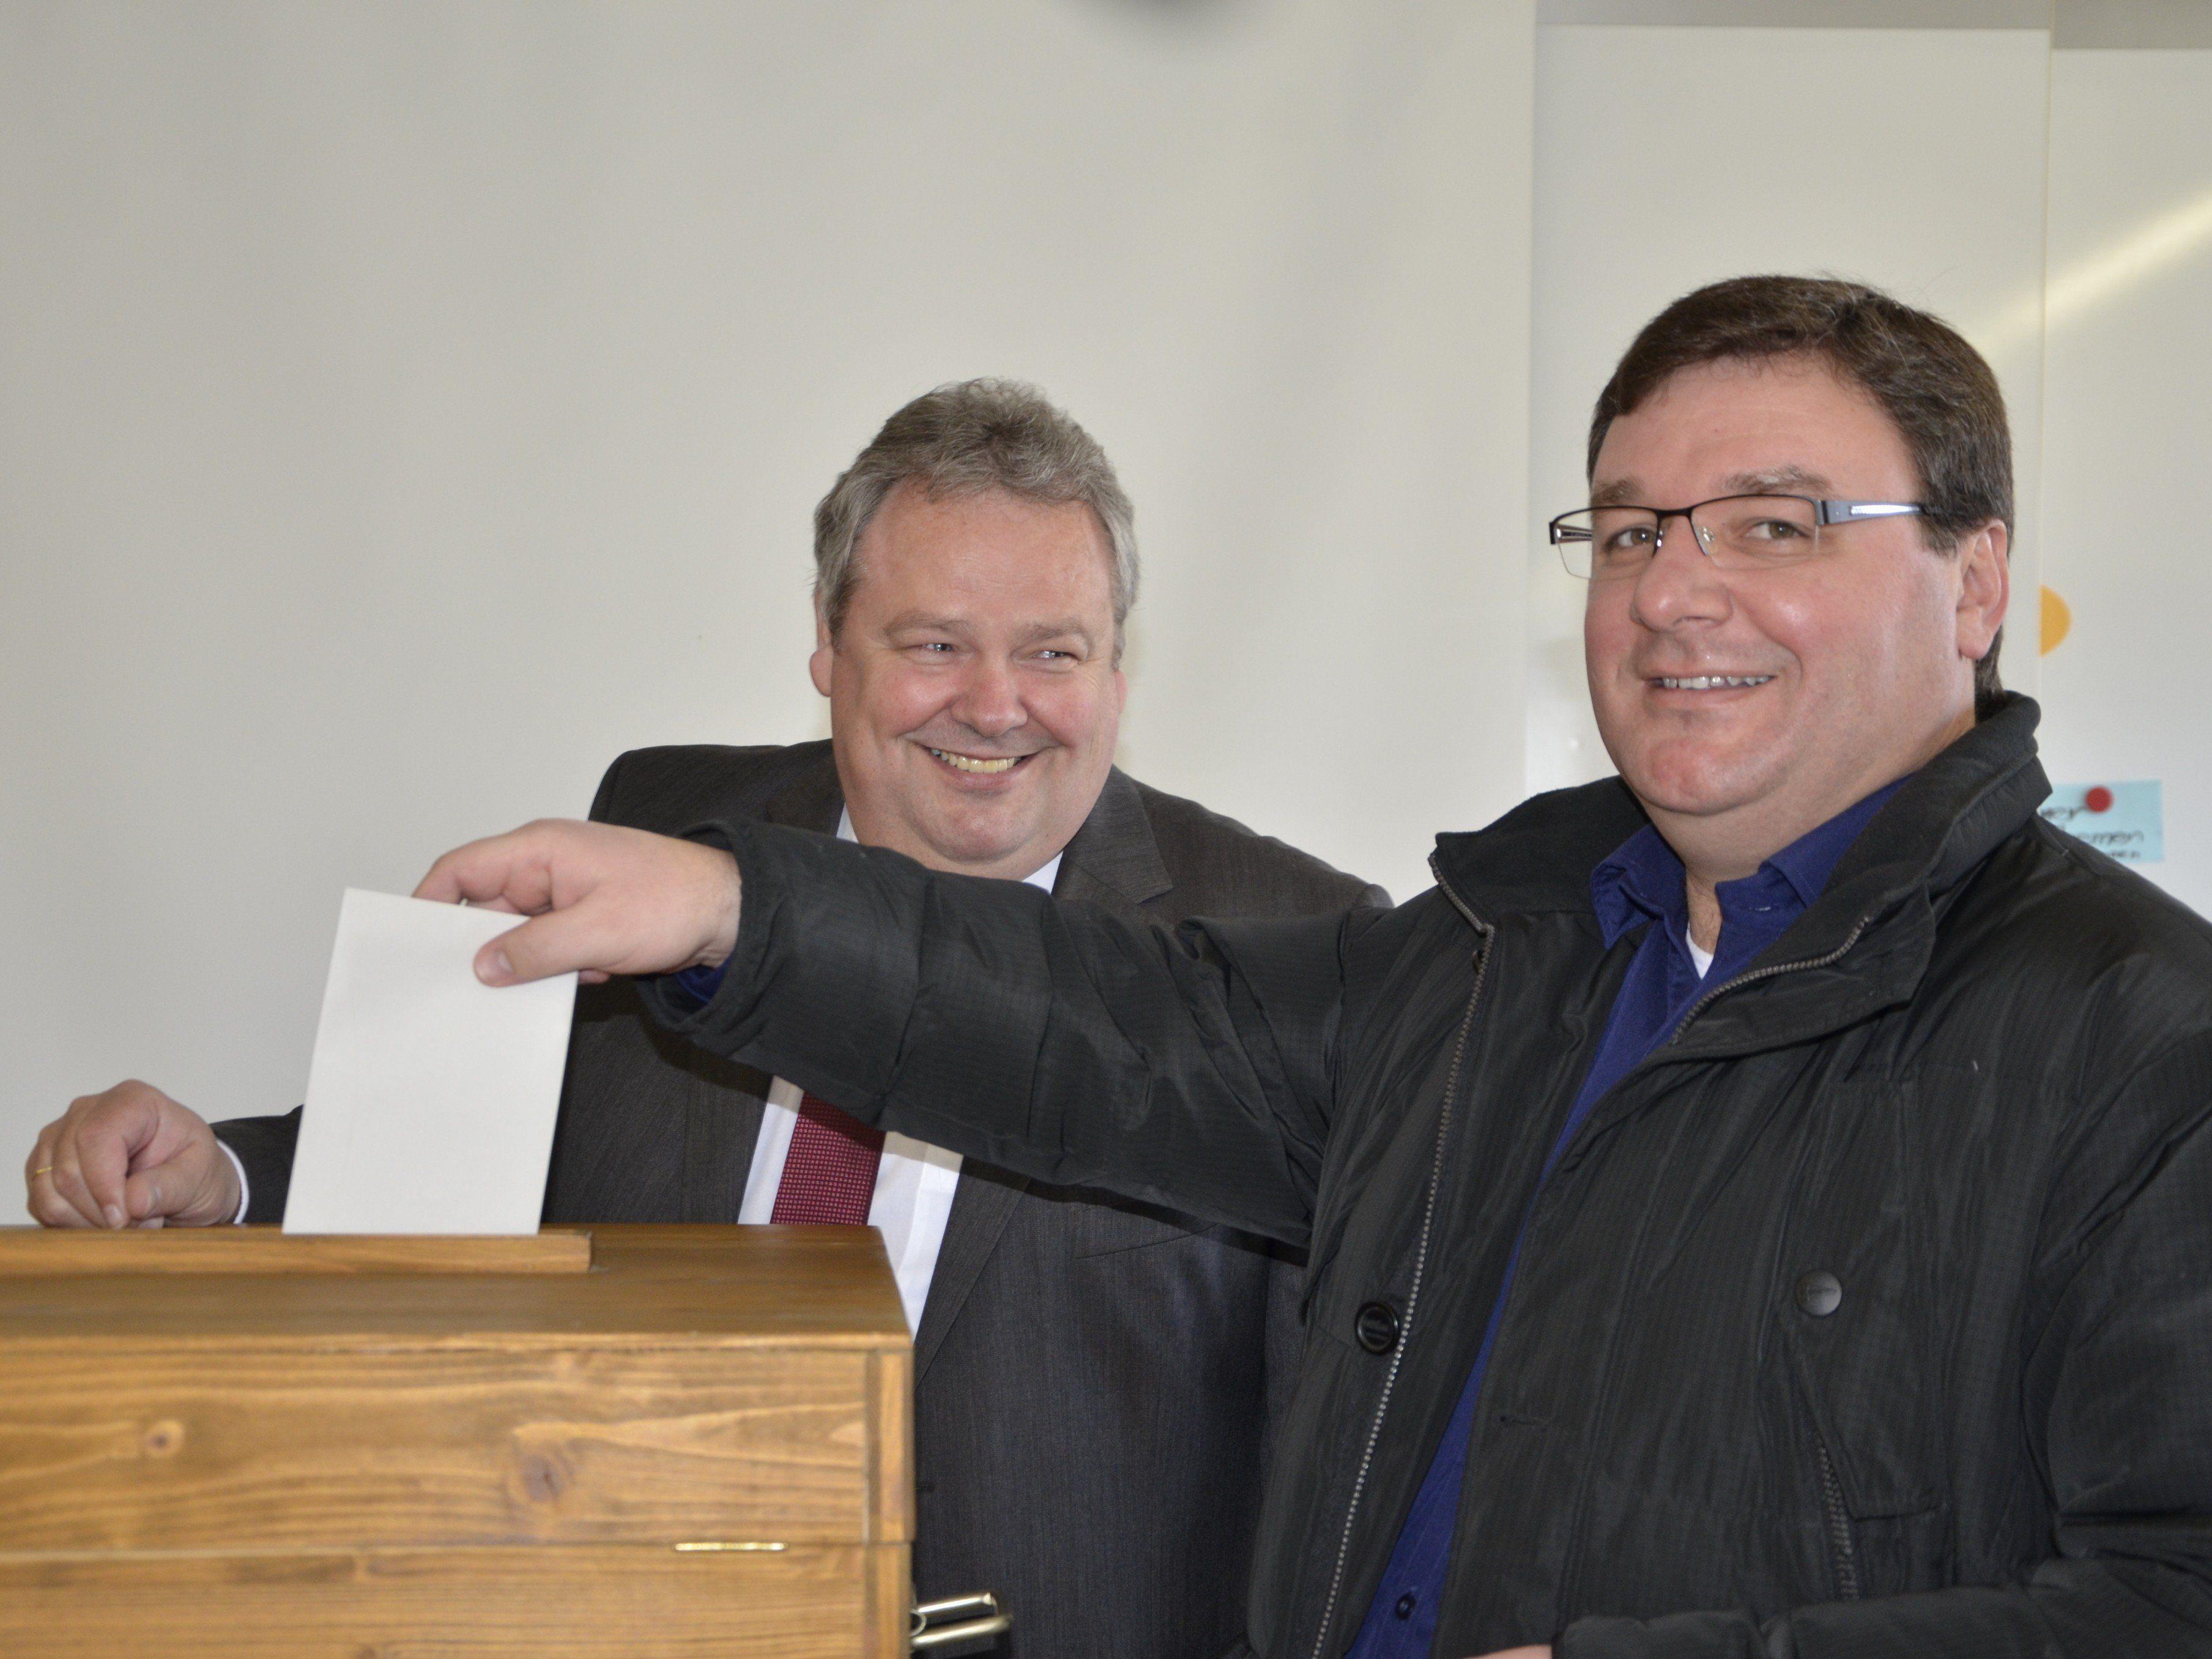 Auch Pfarrer Cristinel Dobos gab seine Stimme ab.